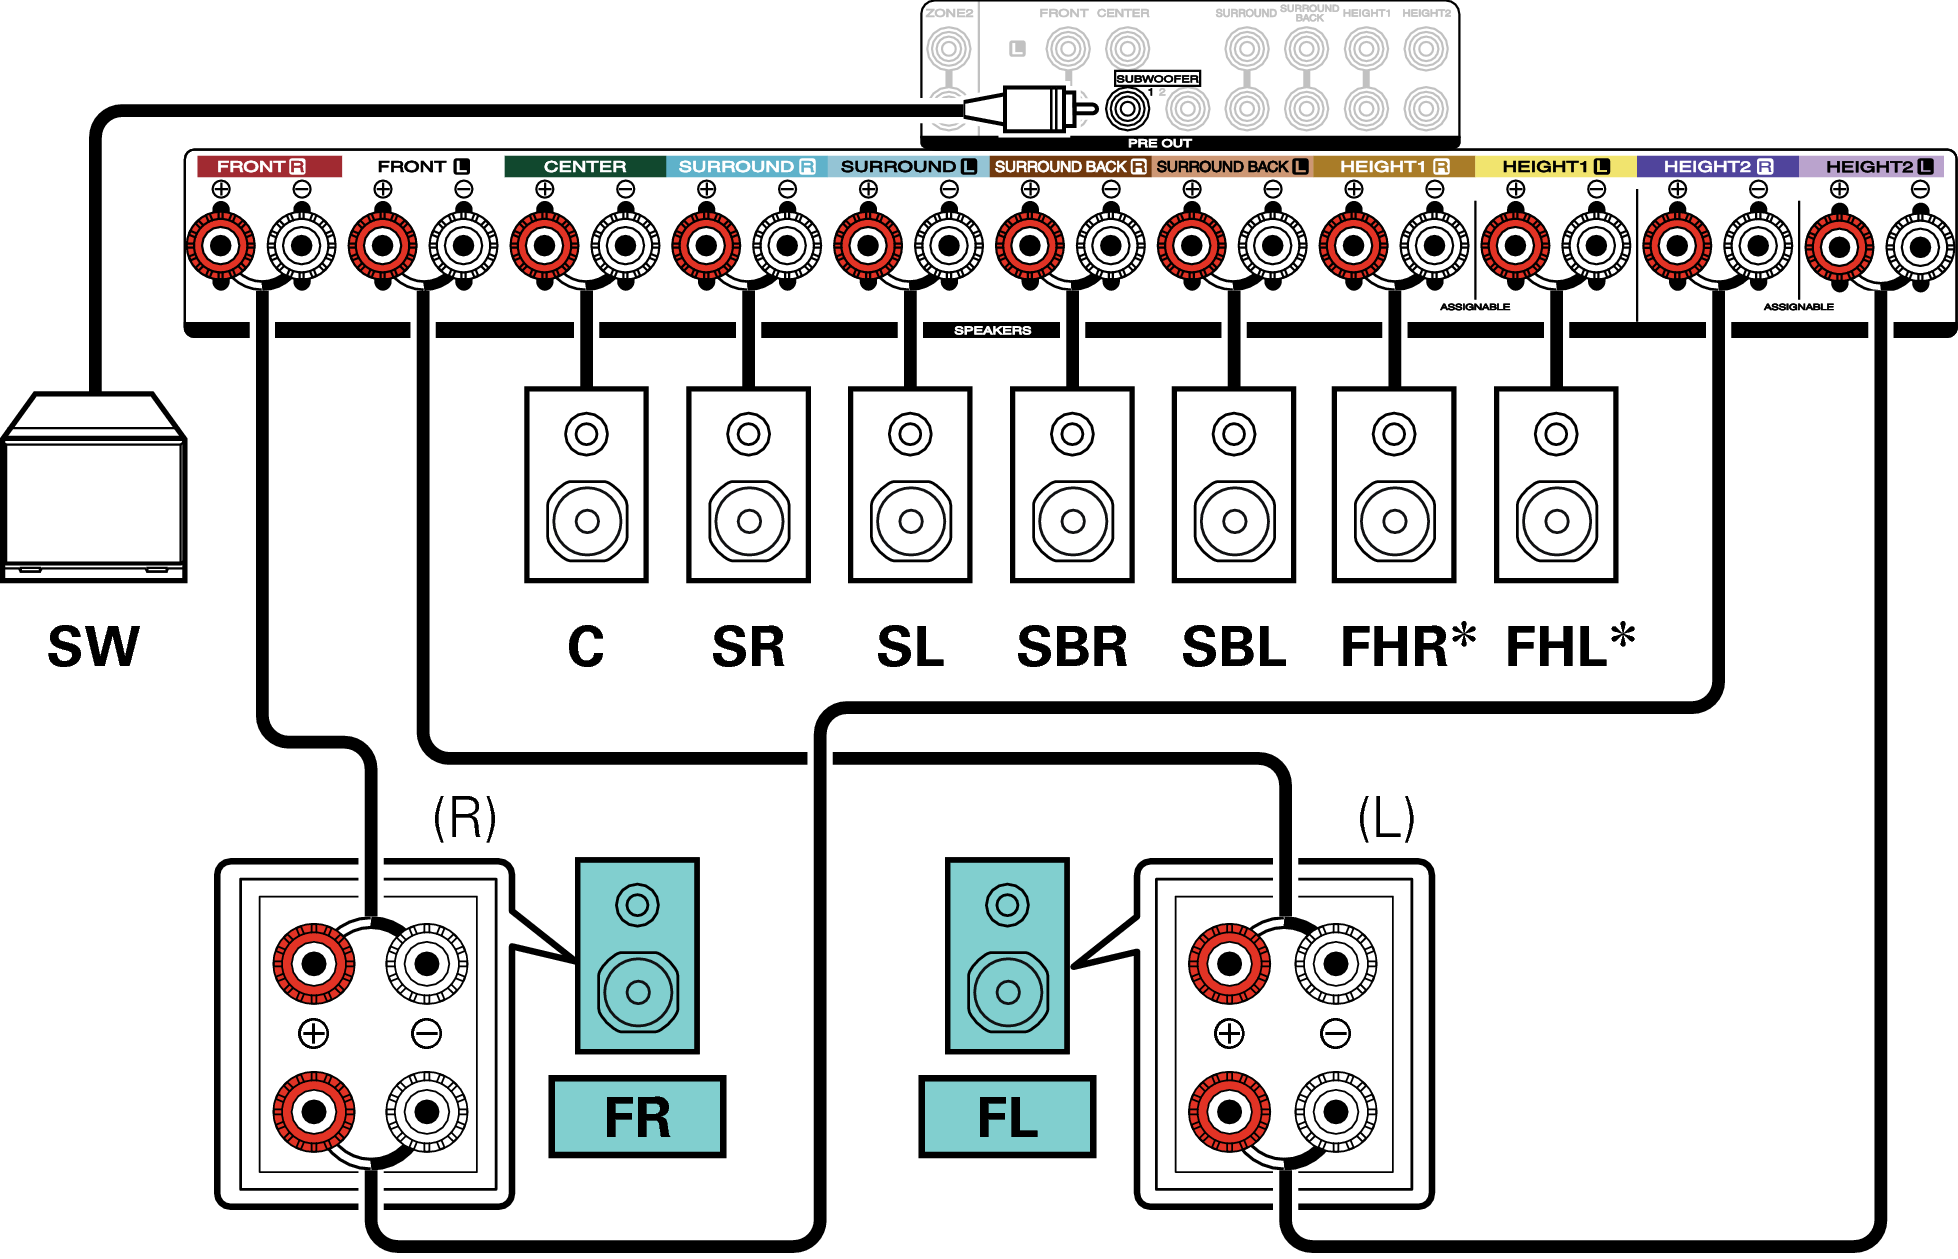 [ANLQ_8698]  Connecting 7.1-channel speakers: Bi-amp connection of front speakers SR6013   Bi Amp Wiring Diagram      manuals.marantz.com